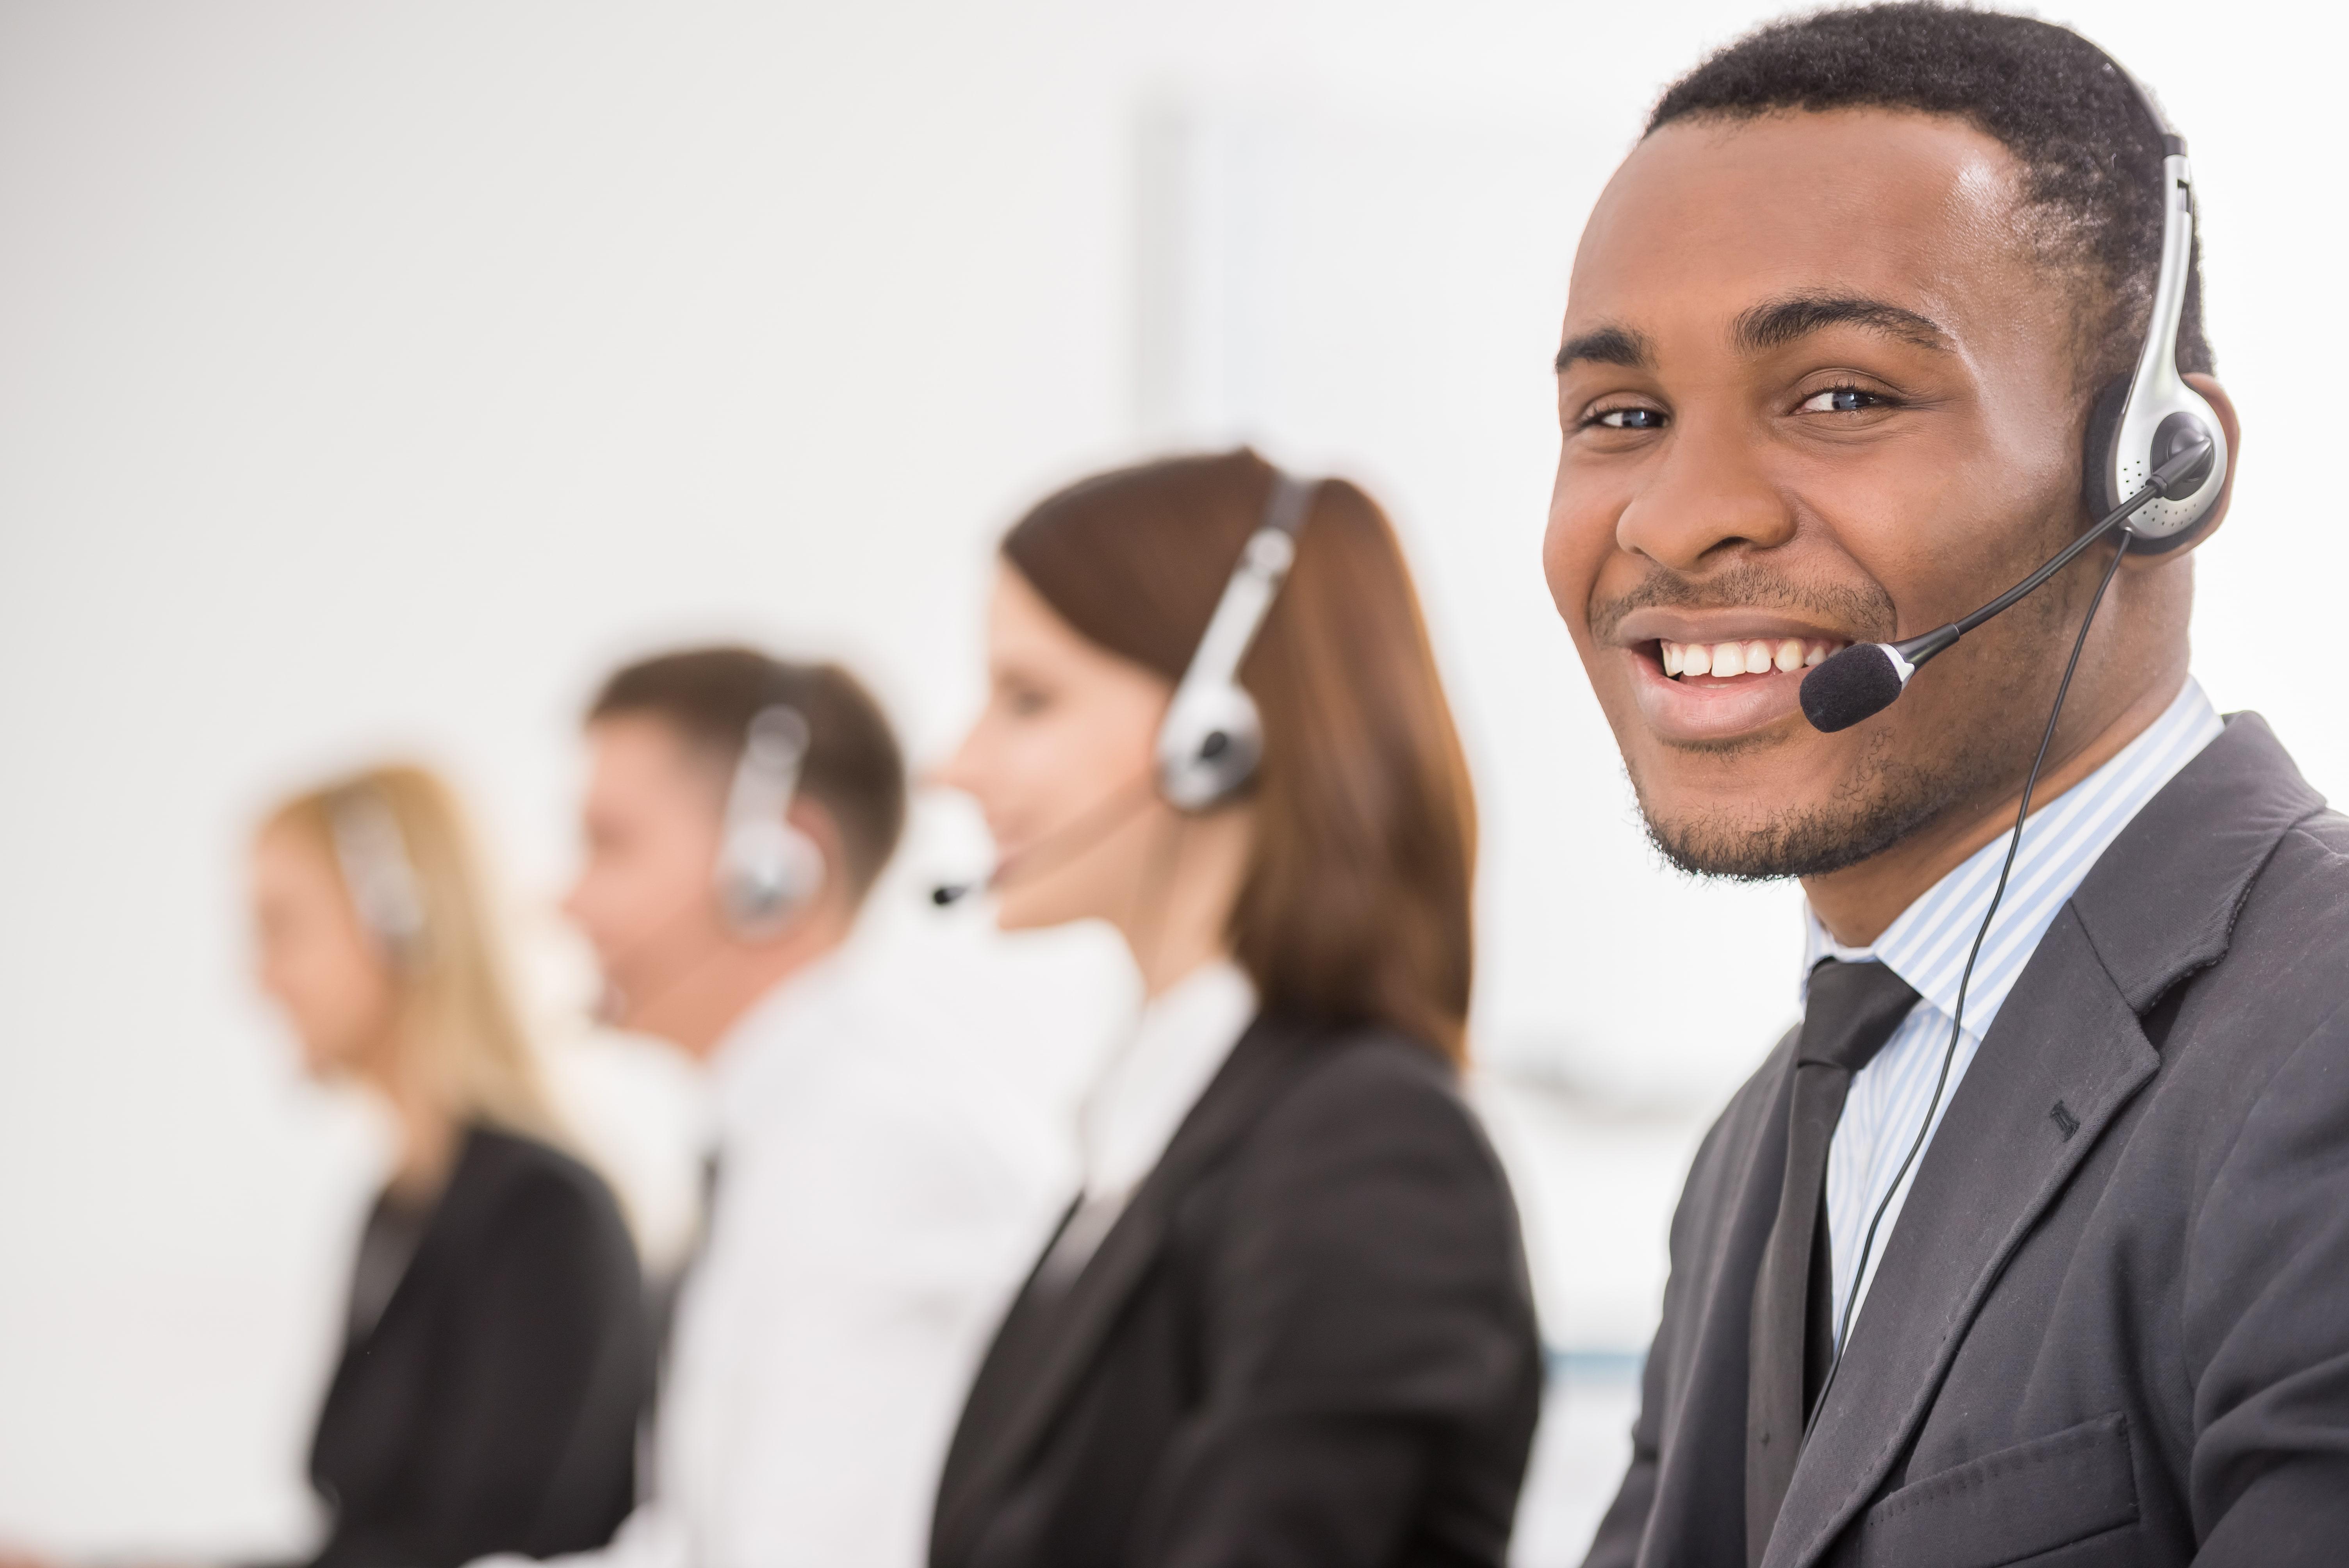 Técnicas de vendas para call center – Como se desenvolver na área